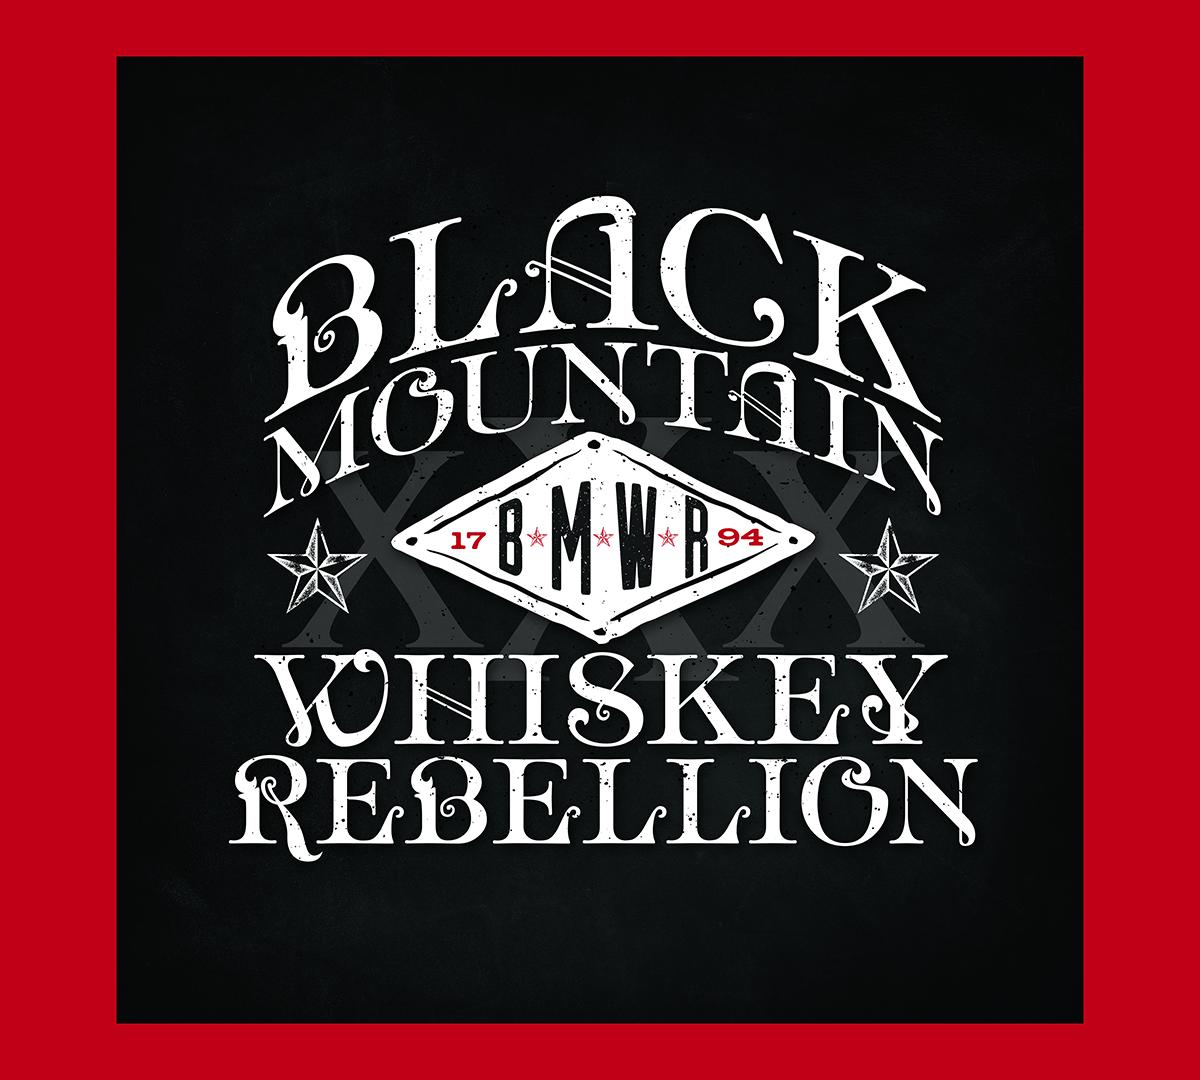 Black Mountain Whiskey Rebellion Release Self-Titled Debut Album